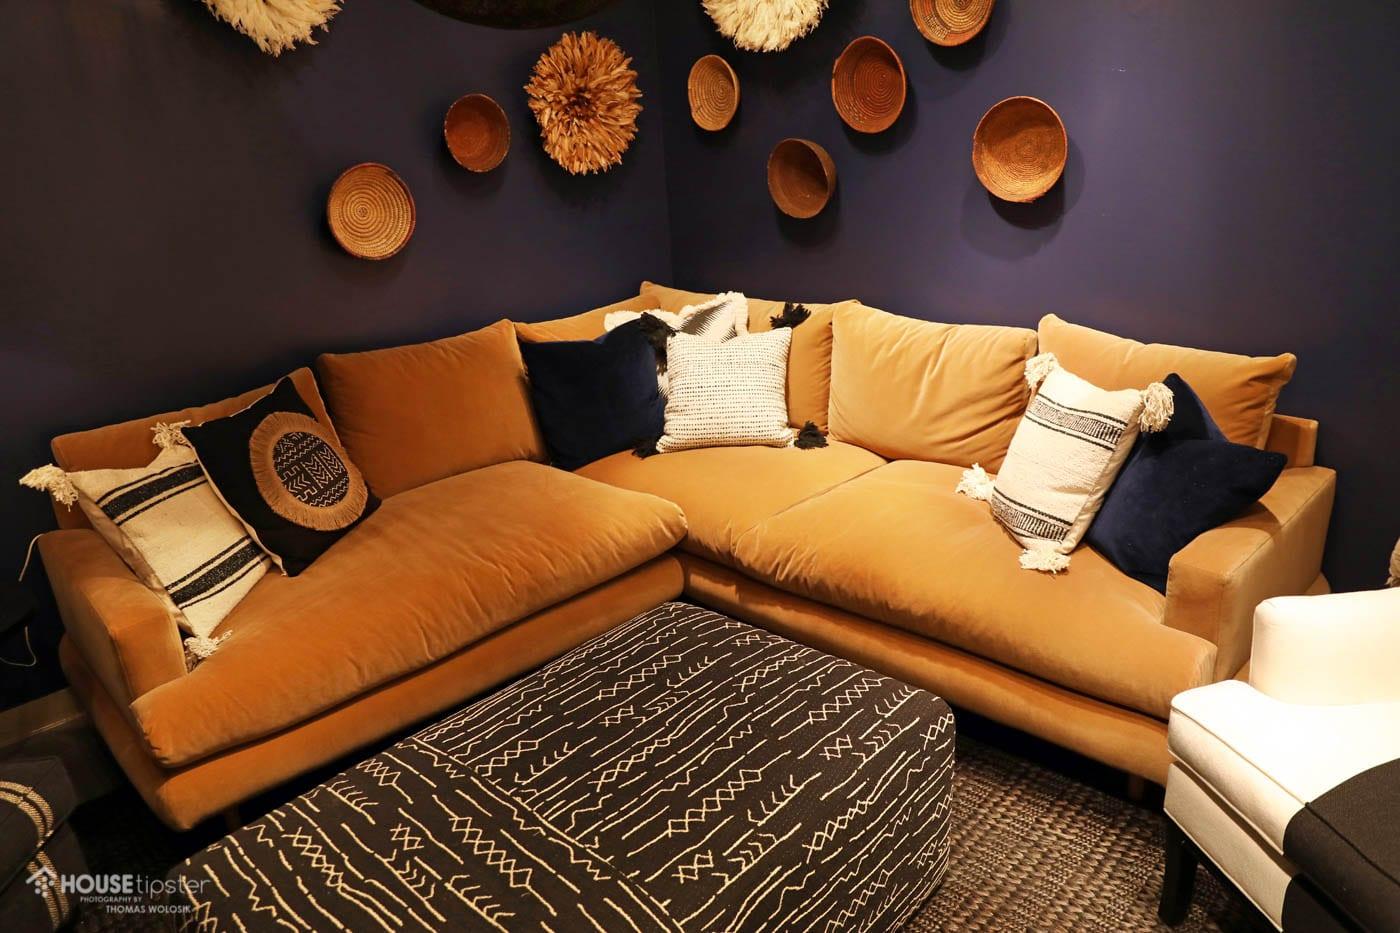 Stupendous Kim Salmela Brings Texture And Taste To Her Norwalk Forskolin Free Trial Chair Design Images Forskolin Free Trialorg